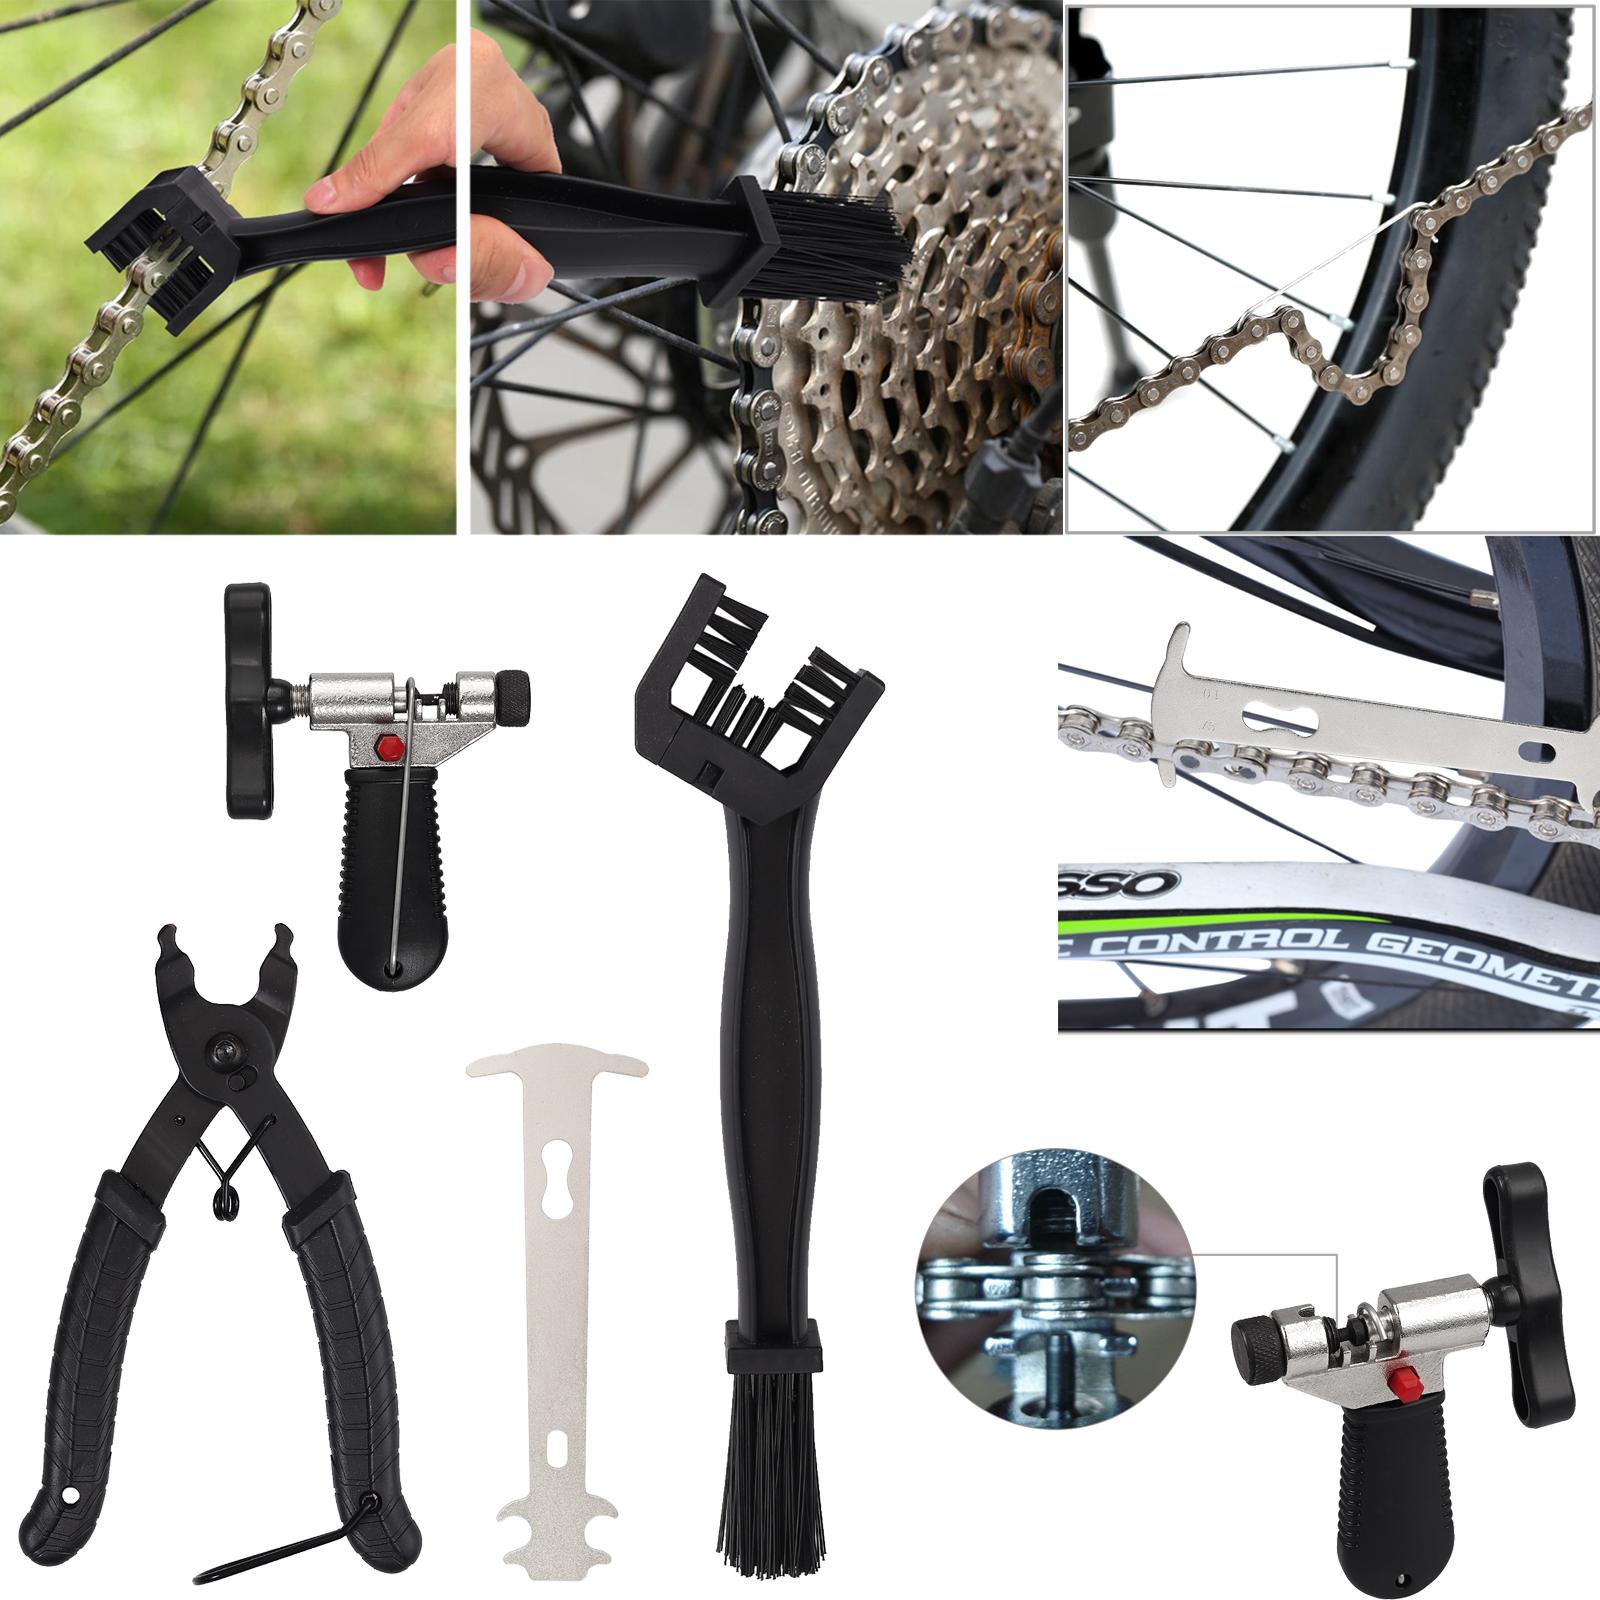 19 in1 Bike Bicycle Cycling Chain Breaker Splitter Cutter Remover Repair hot